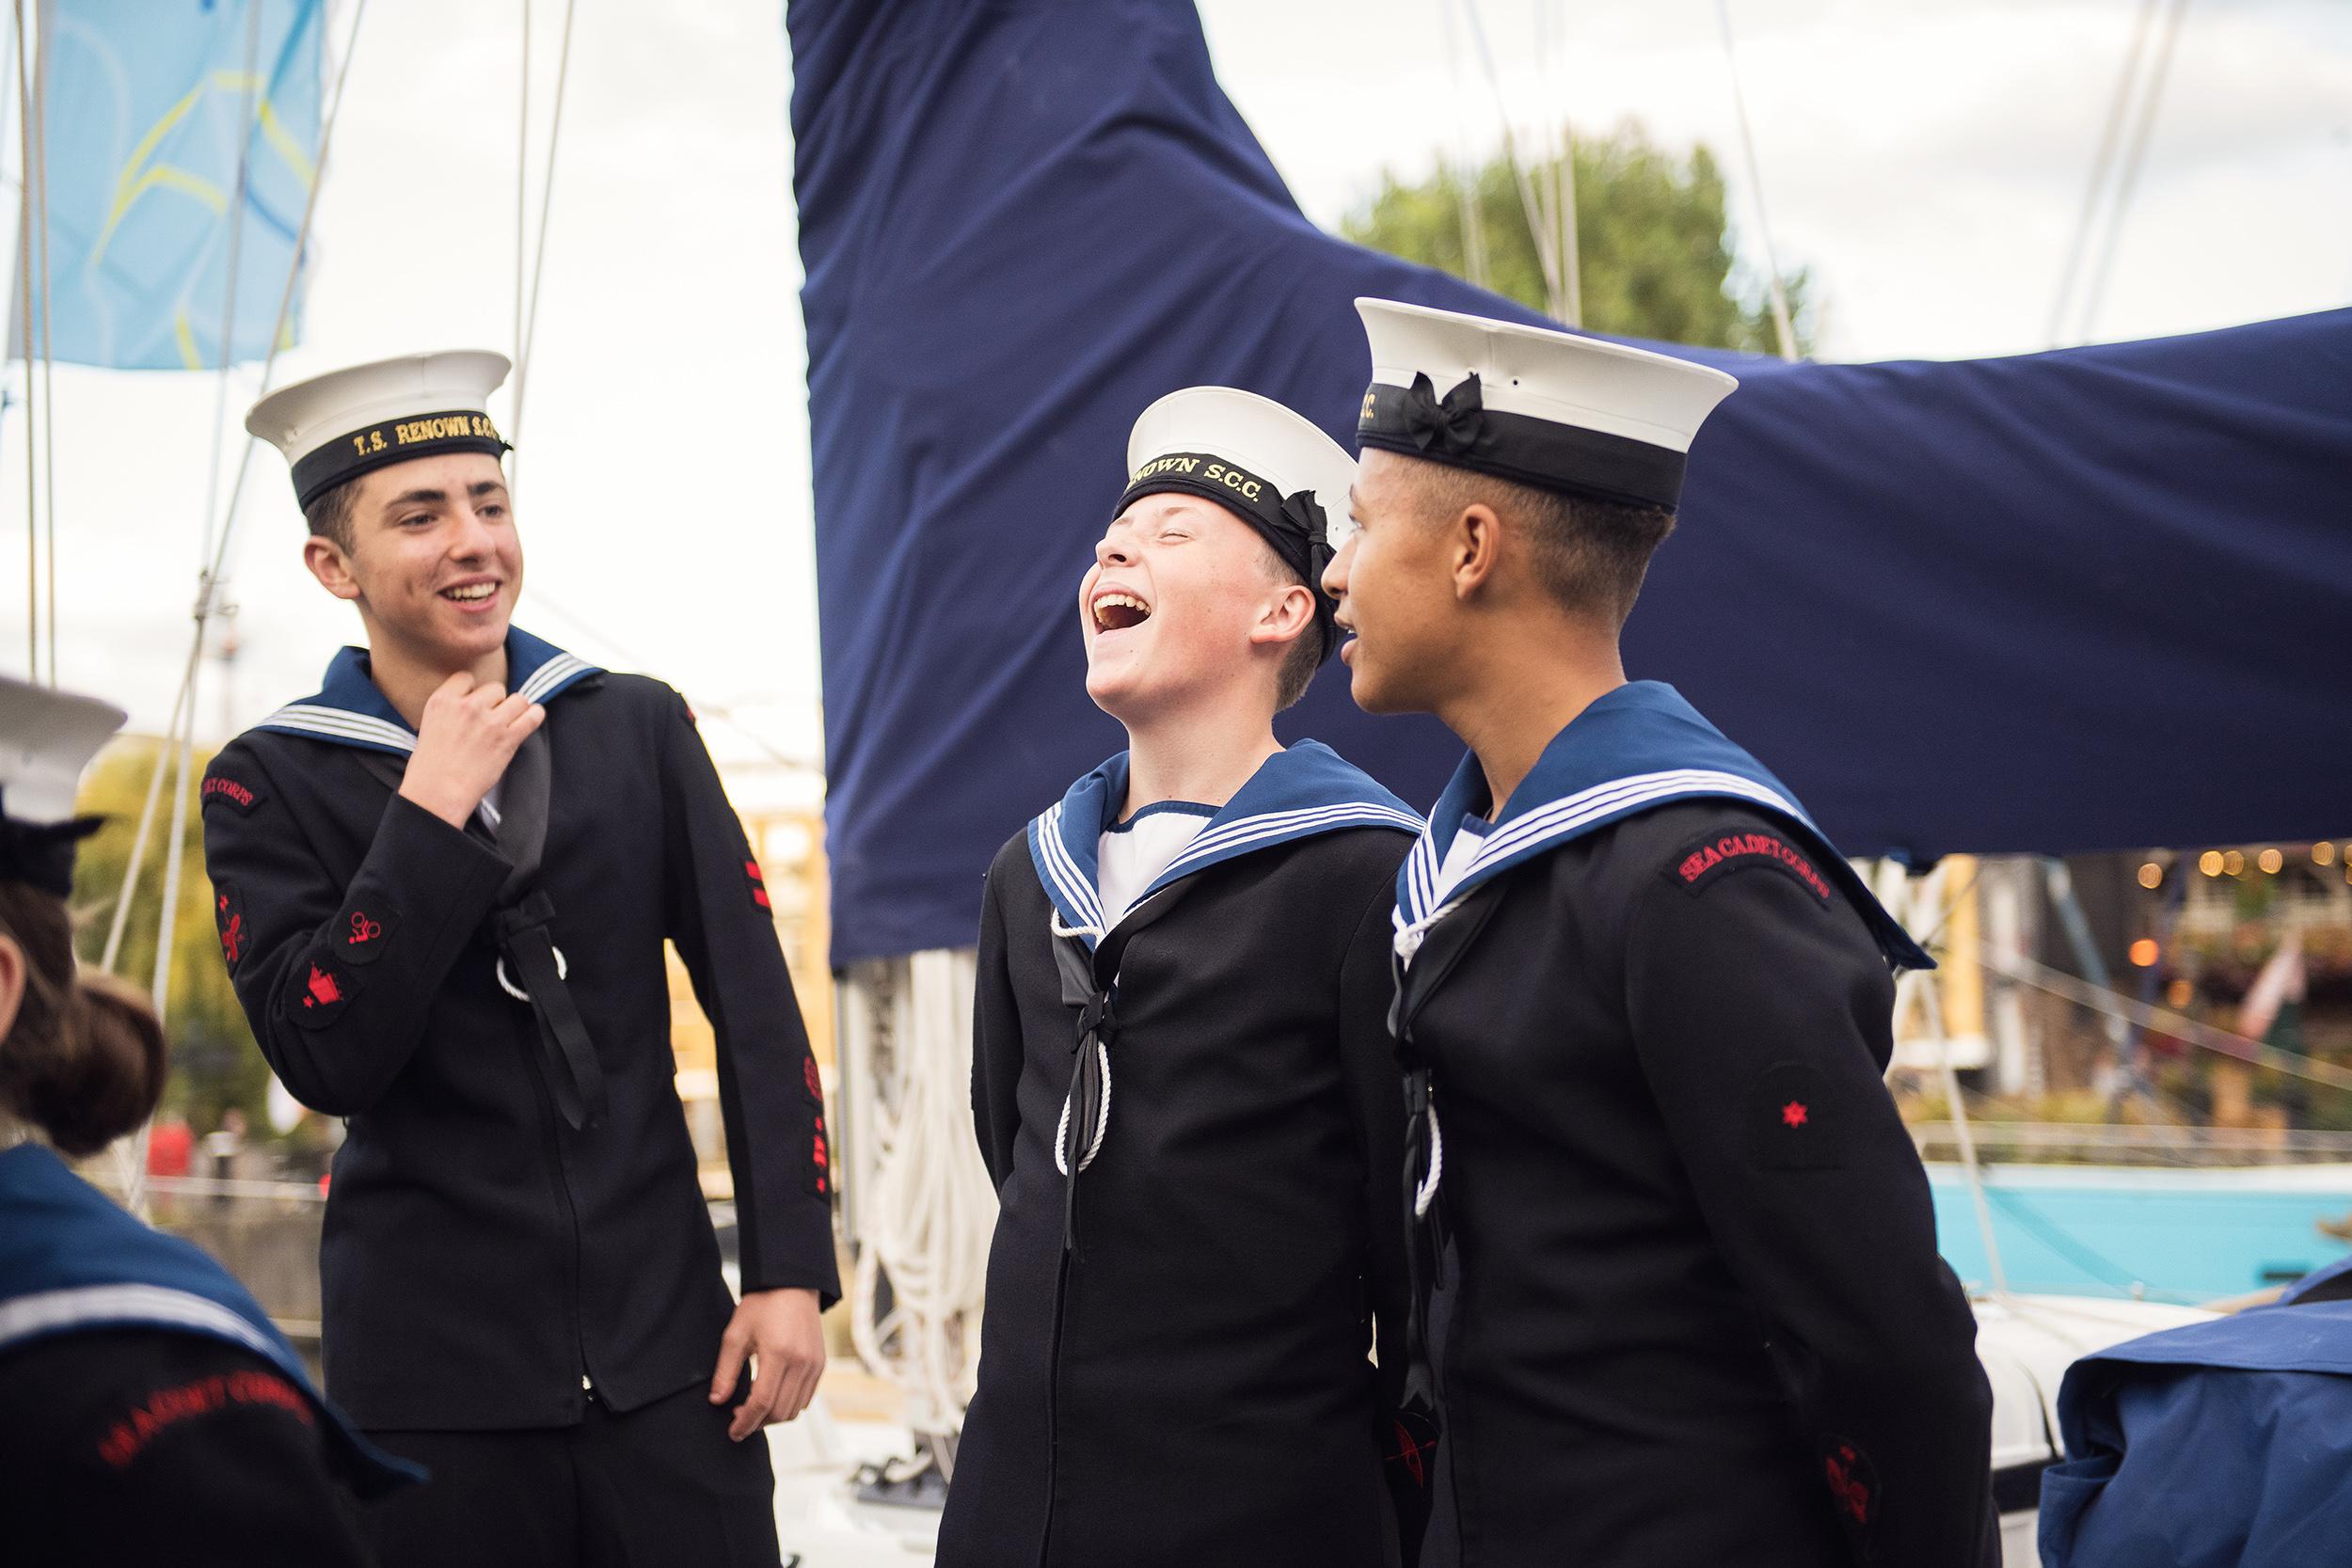 sea+cadets+ts+stellios+2018-69.jpg